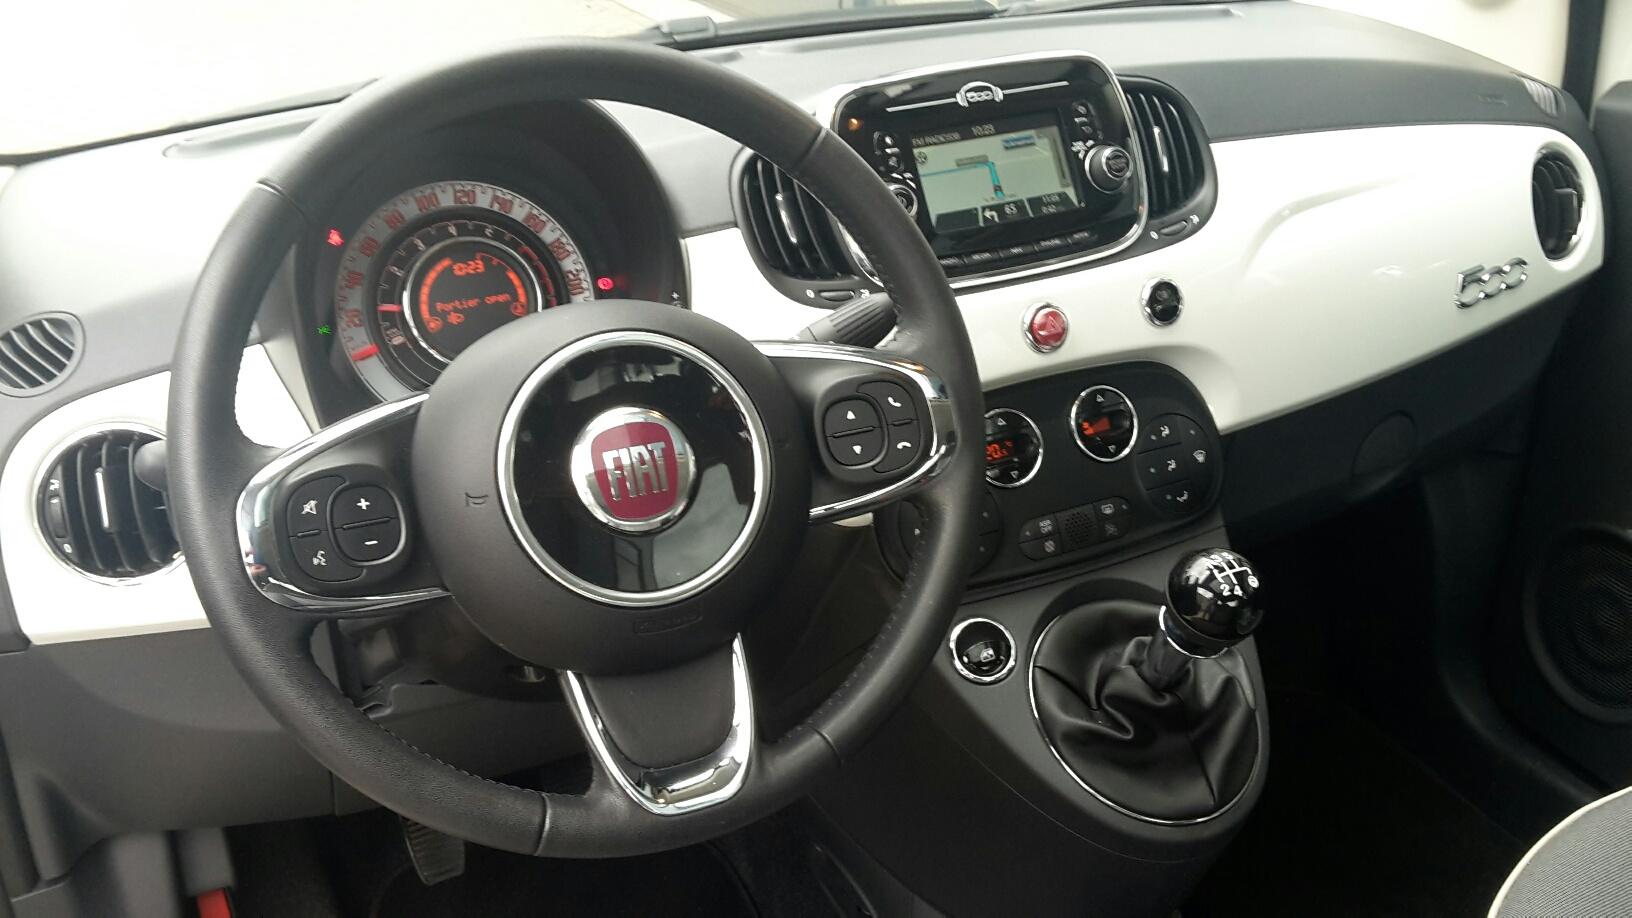 Fiat 500 TwinAir Lounge 80